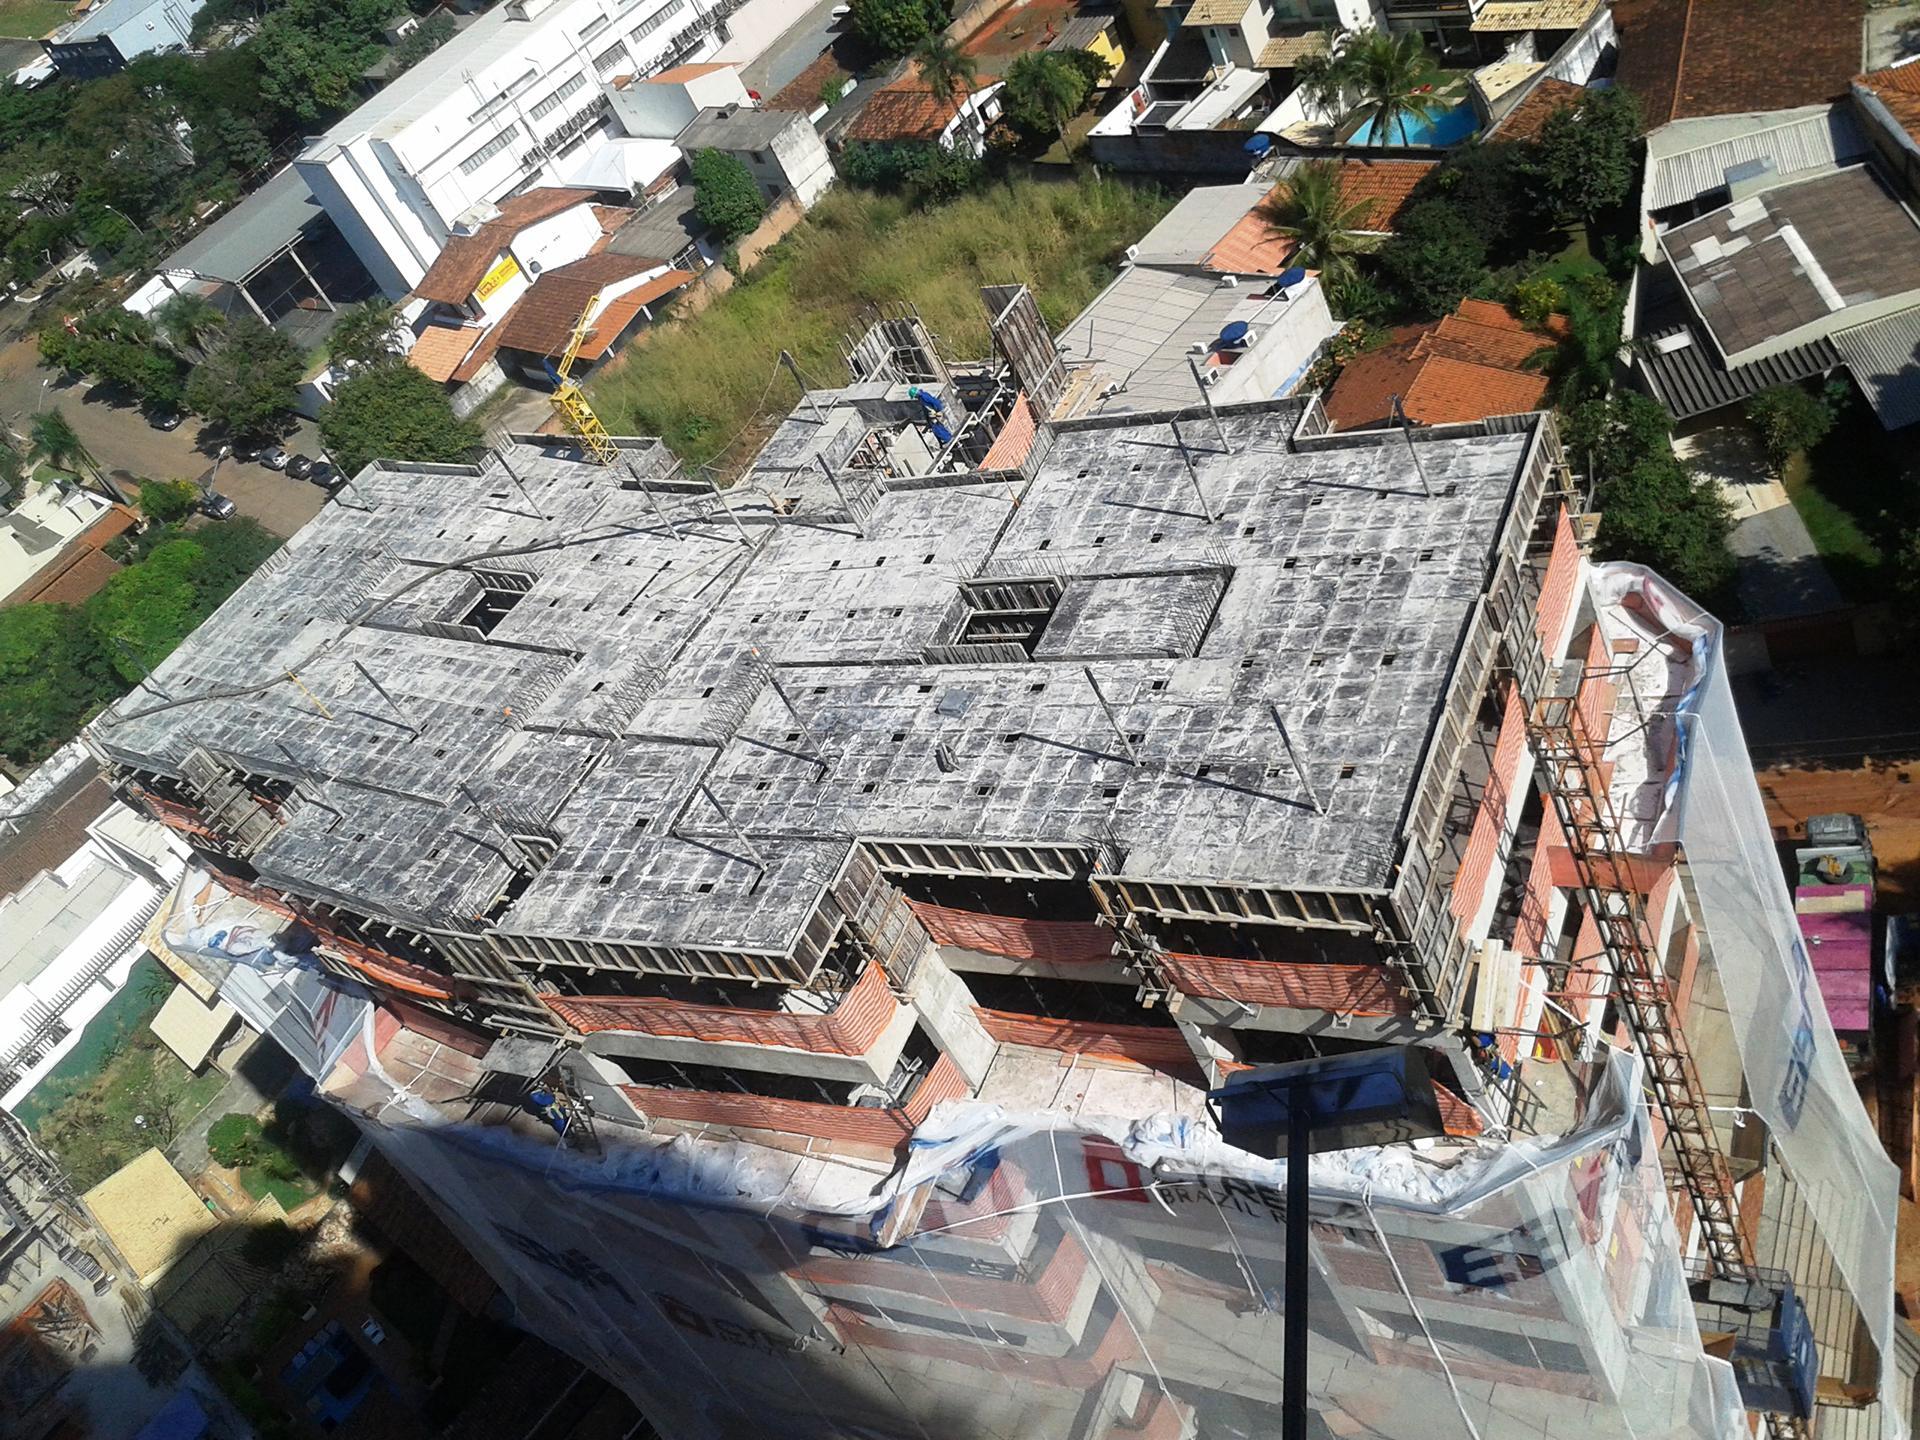 Alvenaria | Chateau Marista LifeStyle – Apartamentono  Setor Marista - Goiânia - Goiás